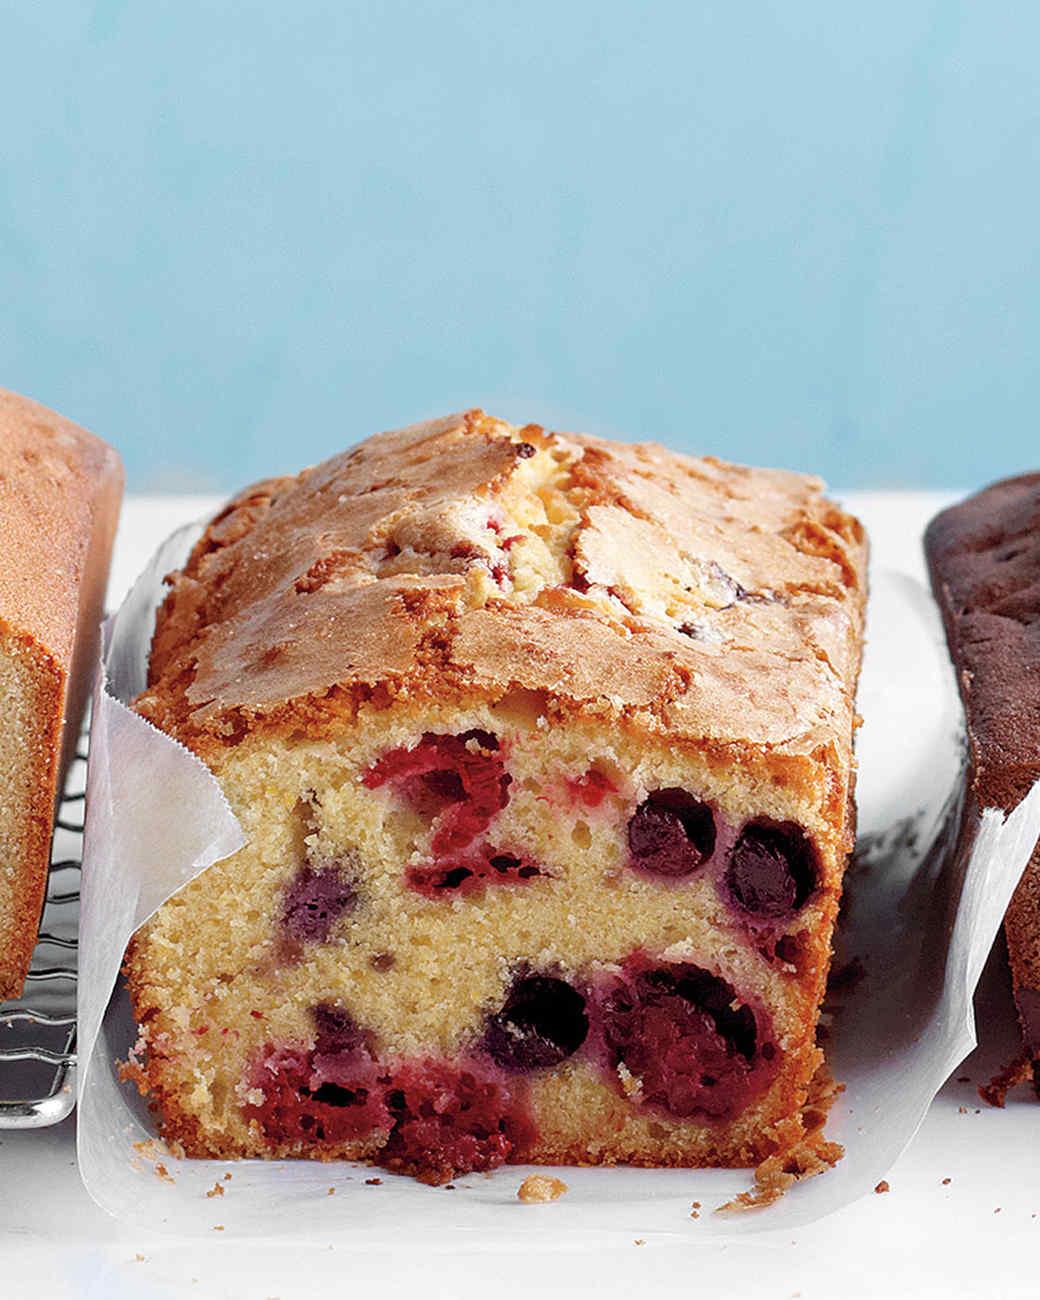 berry-cornmeal-poundcake-miy-0511med106942.jpg